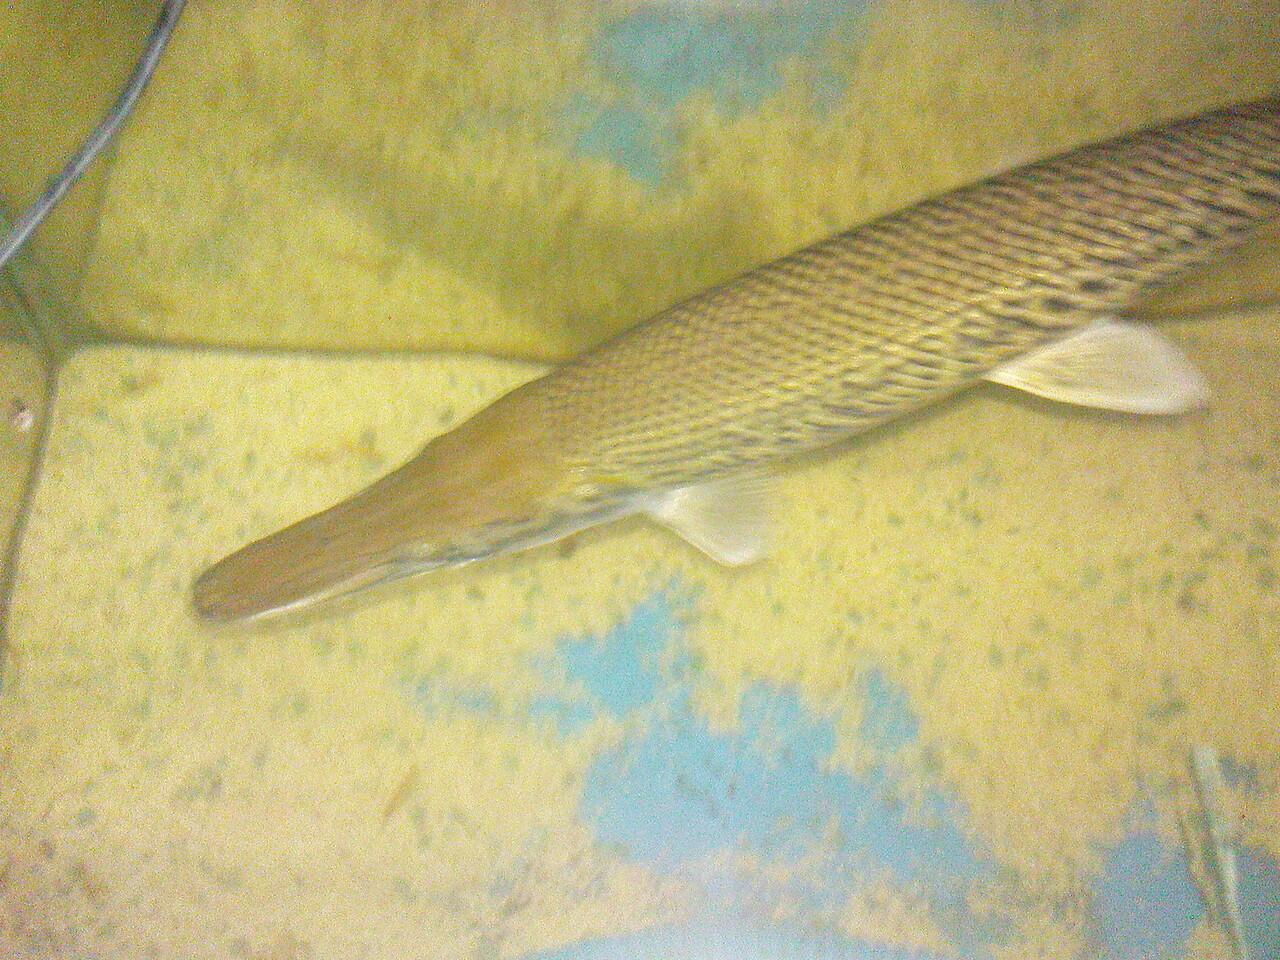 Ikan predator, arwana silver,aligator,belida